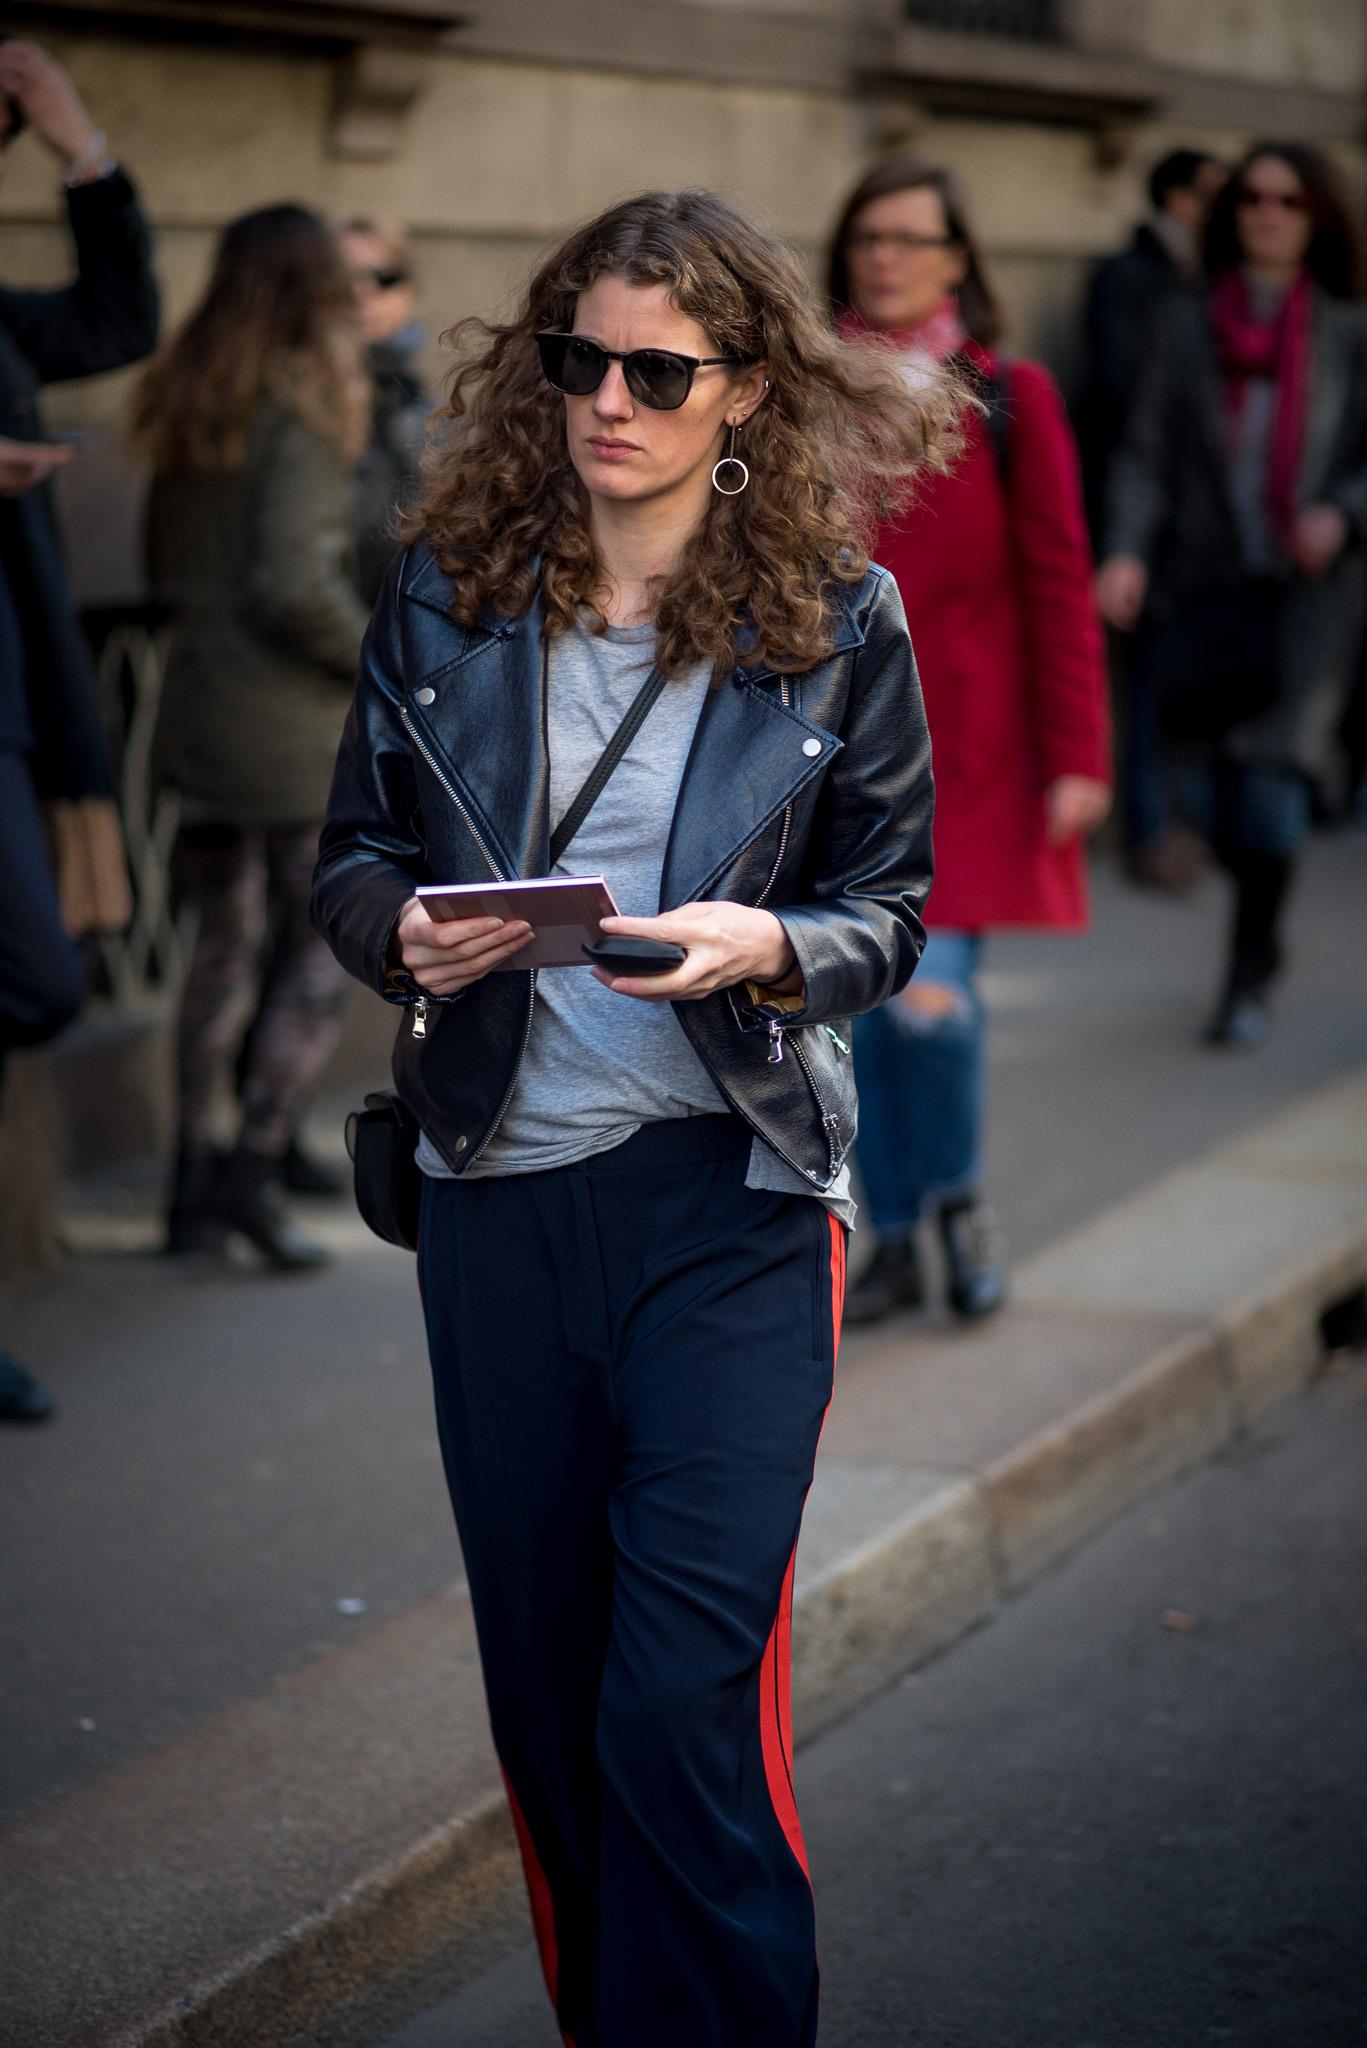 Street Style Moments_Trussardi_Milan Fashion Week_February 26th 2017_Photography Annika Lagerqvist_www.annikasomething.com